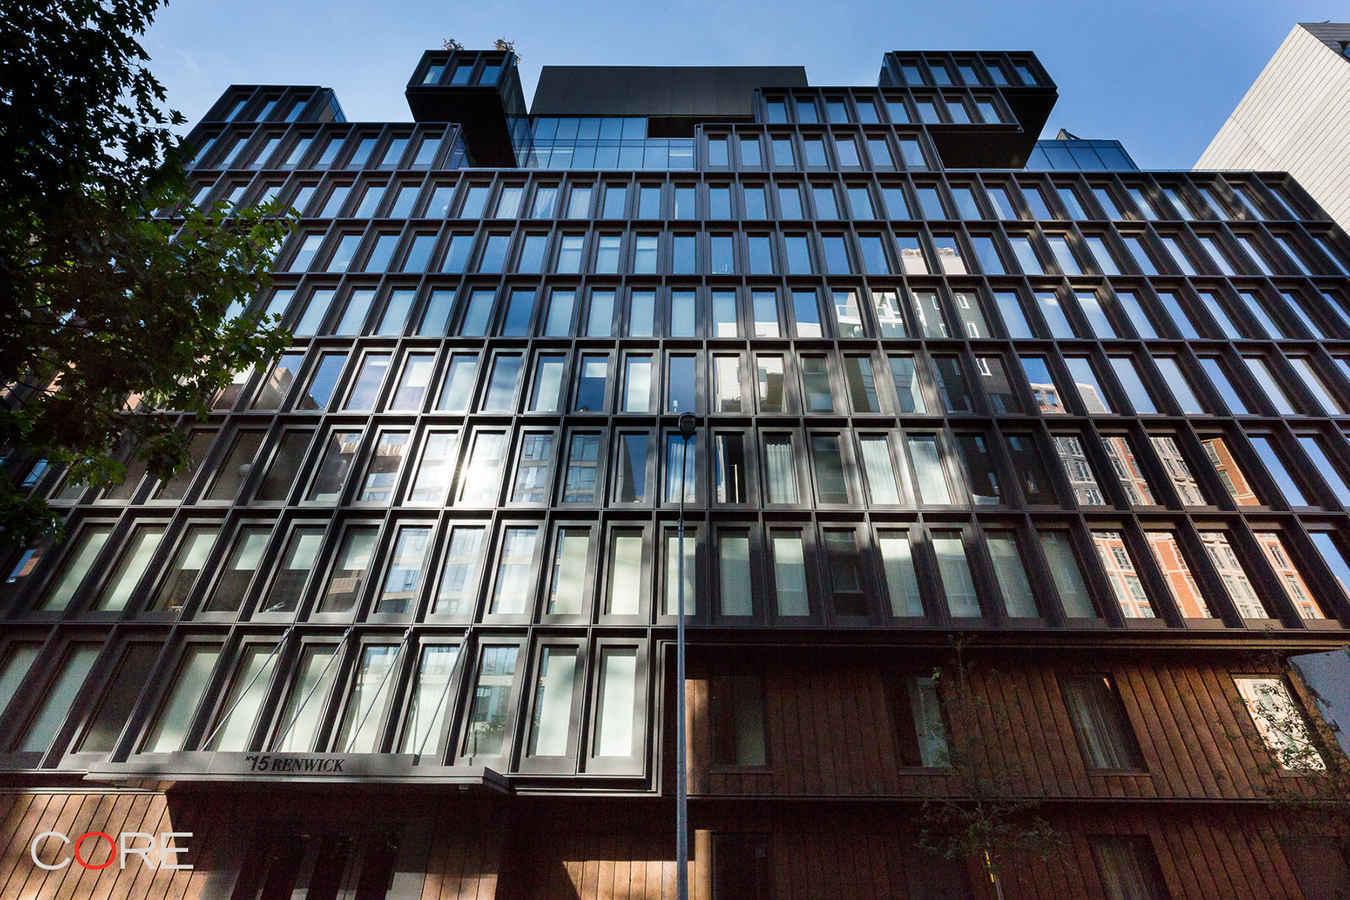 Apartment for sale at 15 Renwick Street, Apt PH3